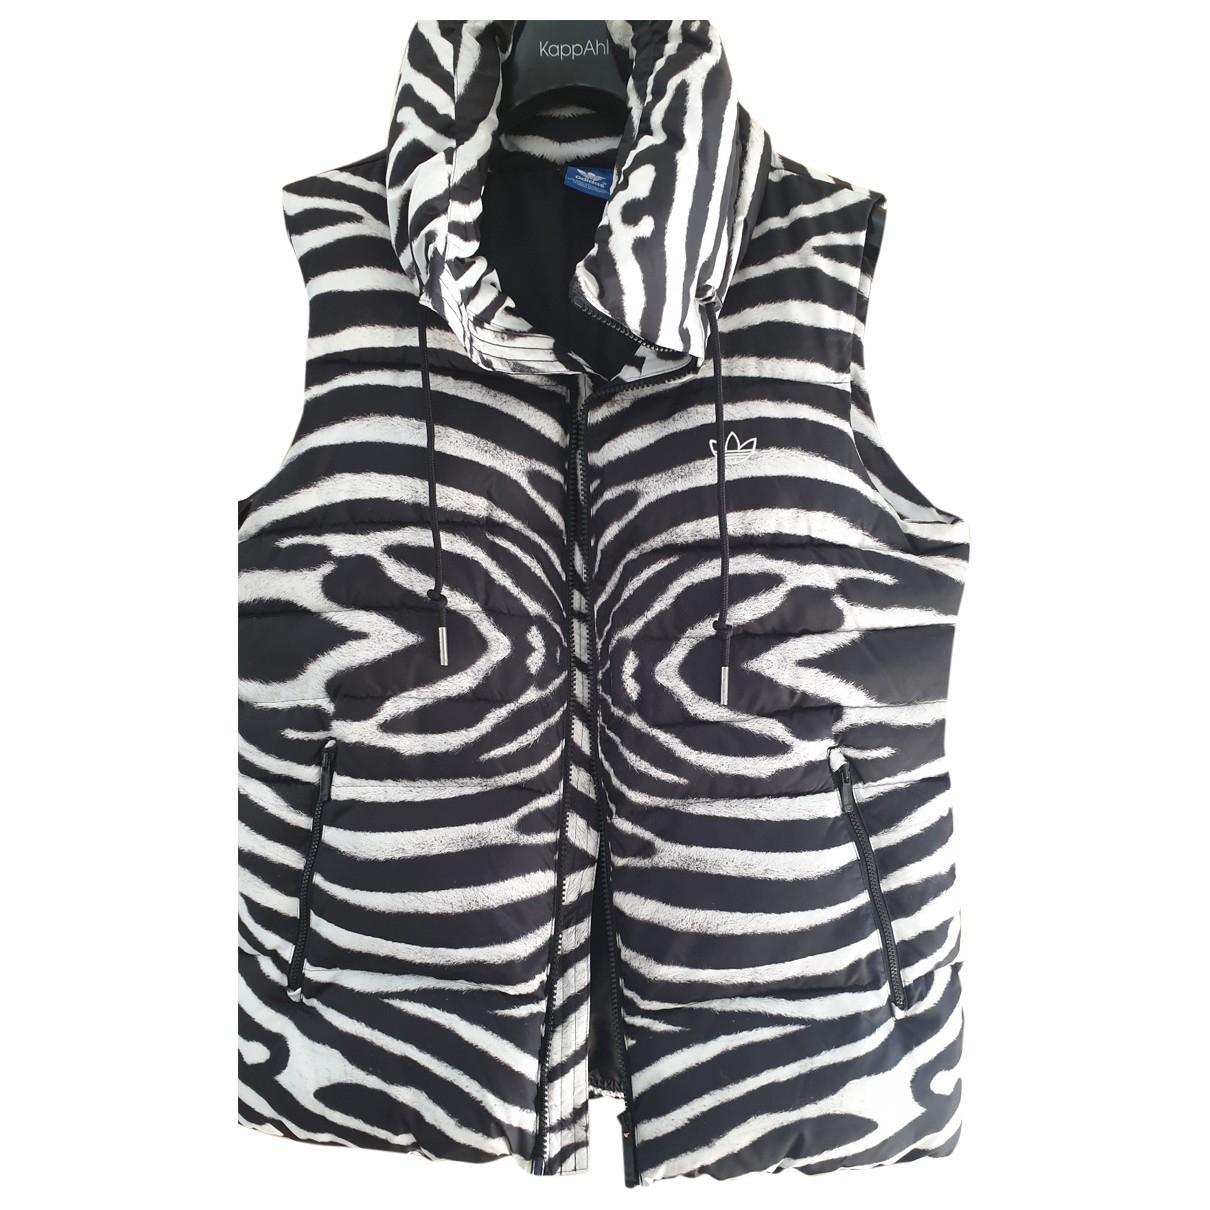 Adidas \N Multicolour jacket for Women 14 UK